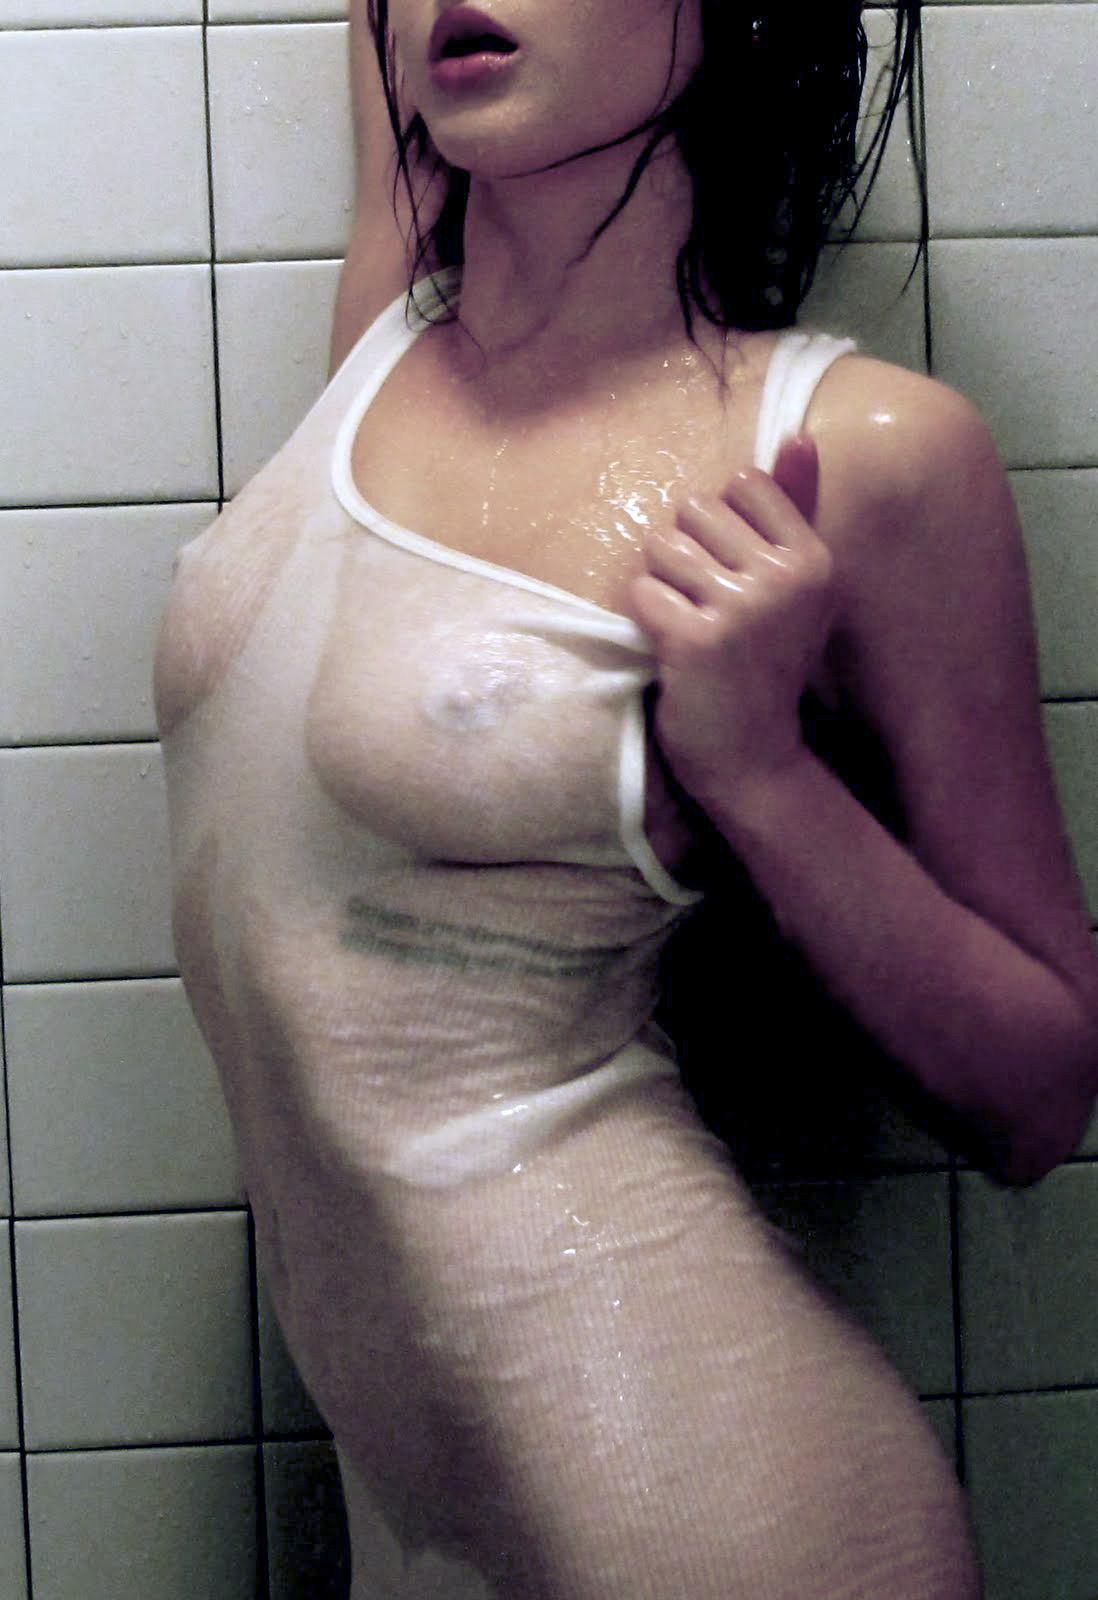 Renee Olstead nude photos leaked The Fappening